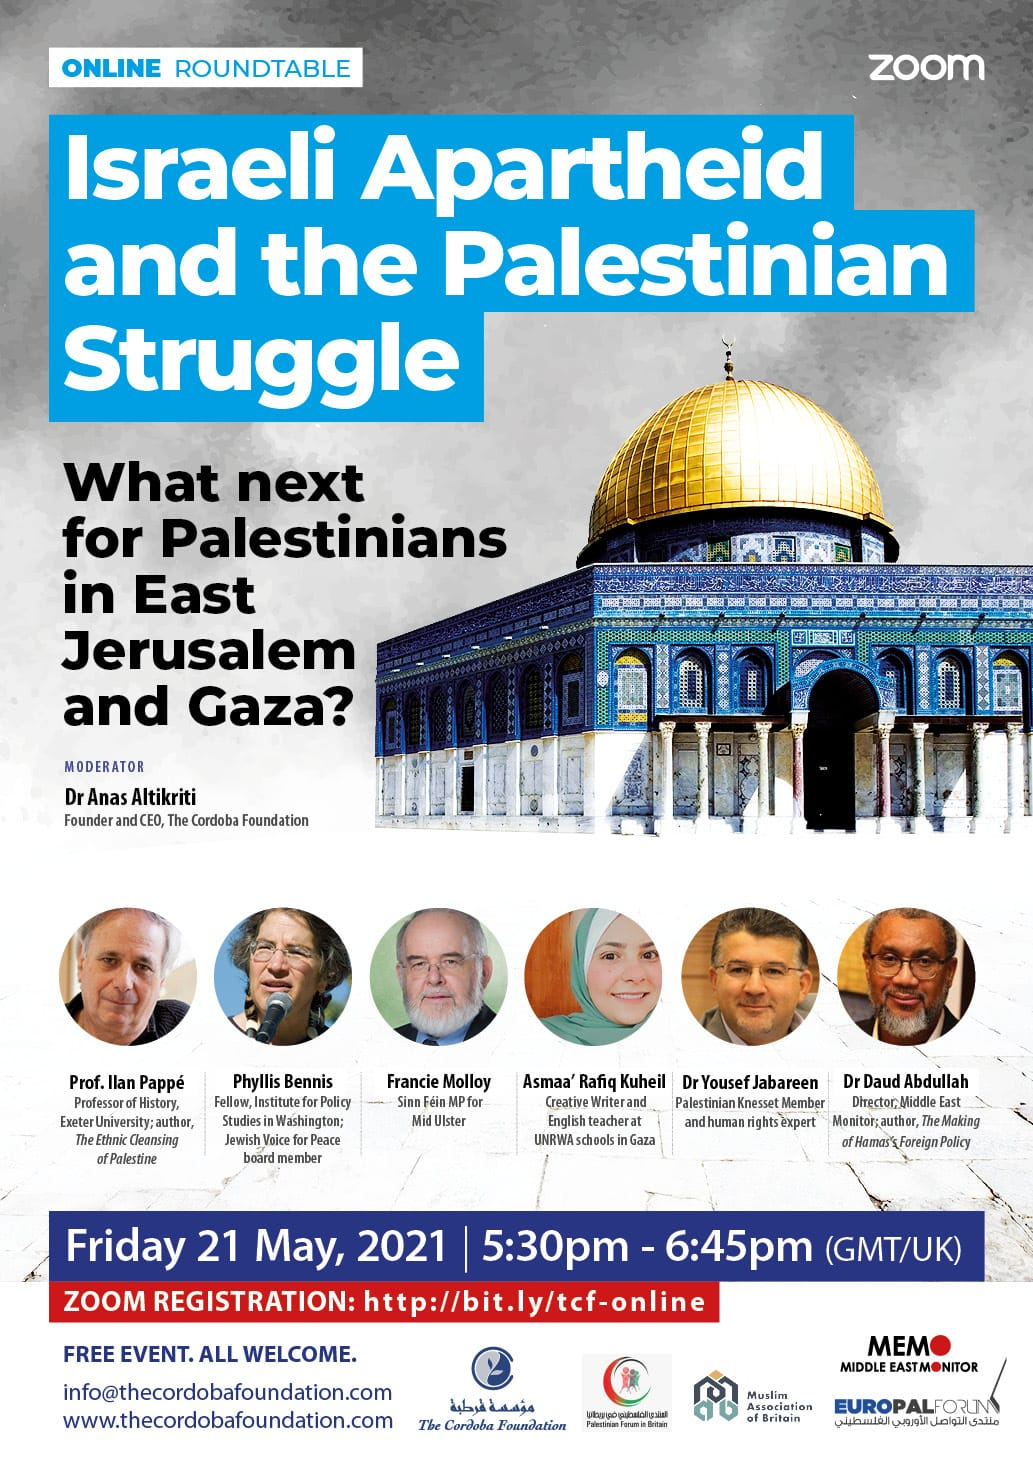 Israeli Apartheid and the Palestinian Struggle